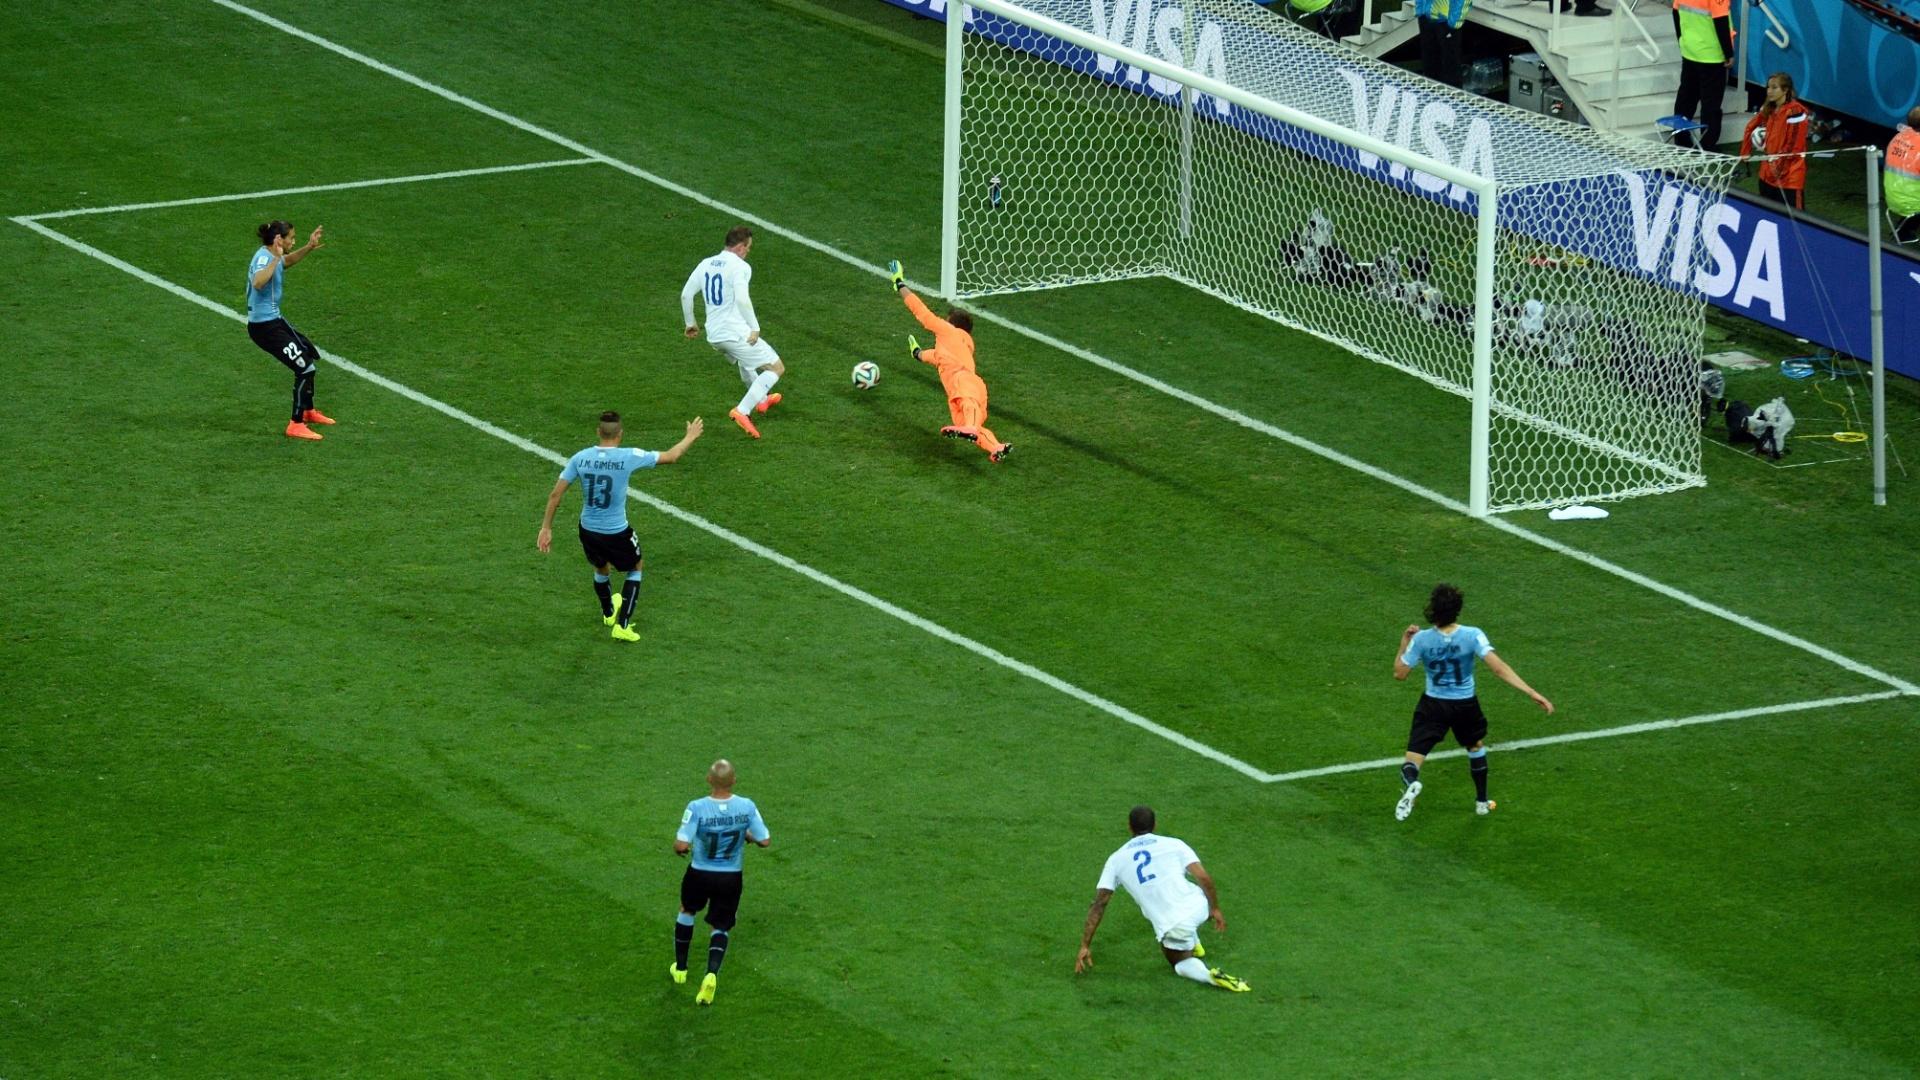 19.jun.2014 - Wayne Rooney aproveita cruzamento e completa para o gol, empatando o jogo para a Inglaterra contra o Uruguai